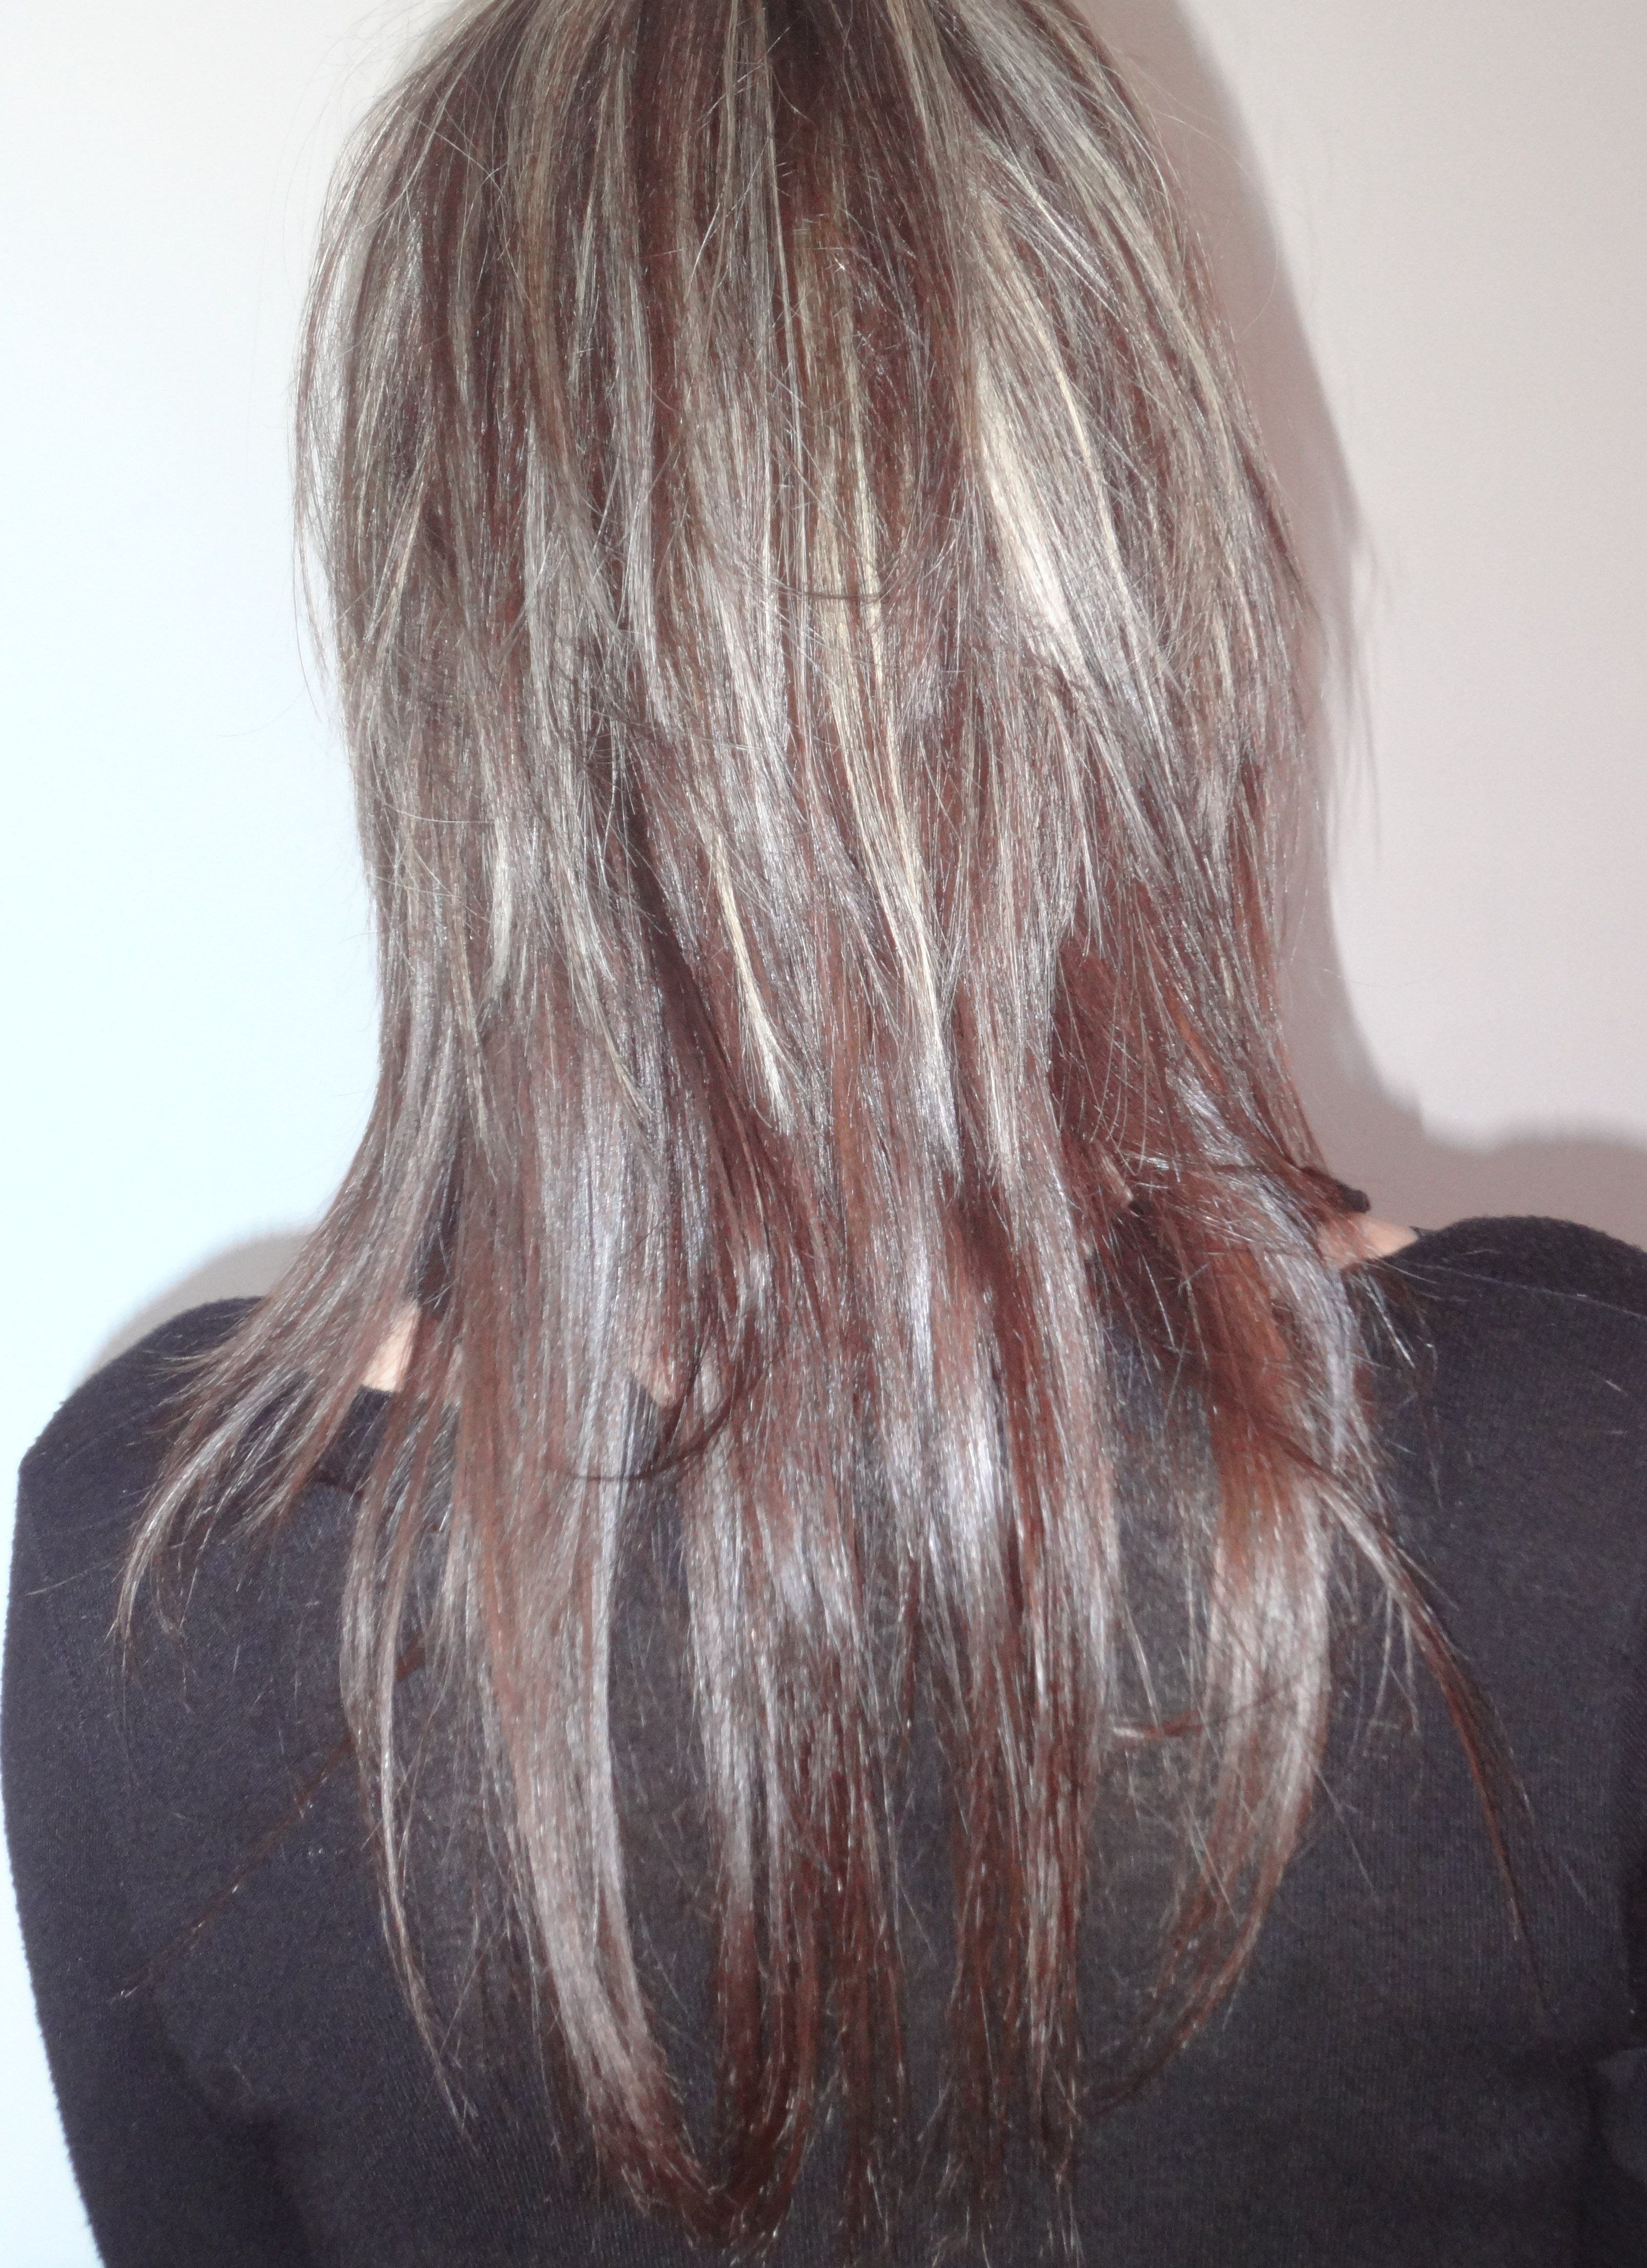 Coiffure Meche Blonde Et Chocolat Coiffure Cheveux Idee